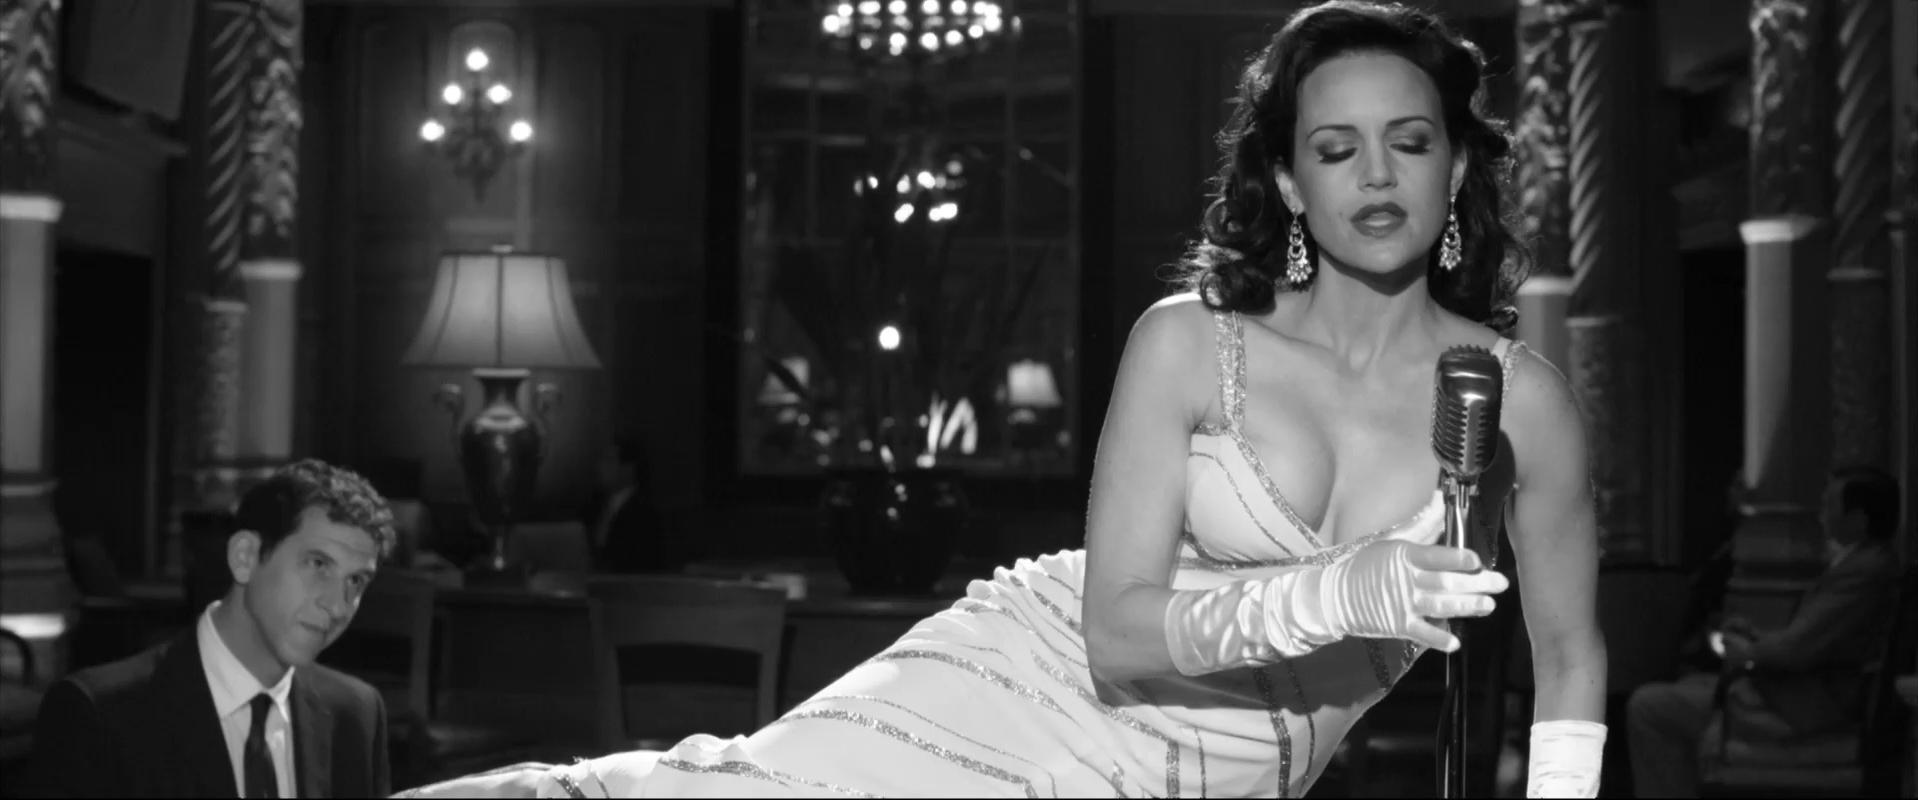 Carla Gugino sexy - Hotel Noir (2012)